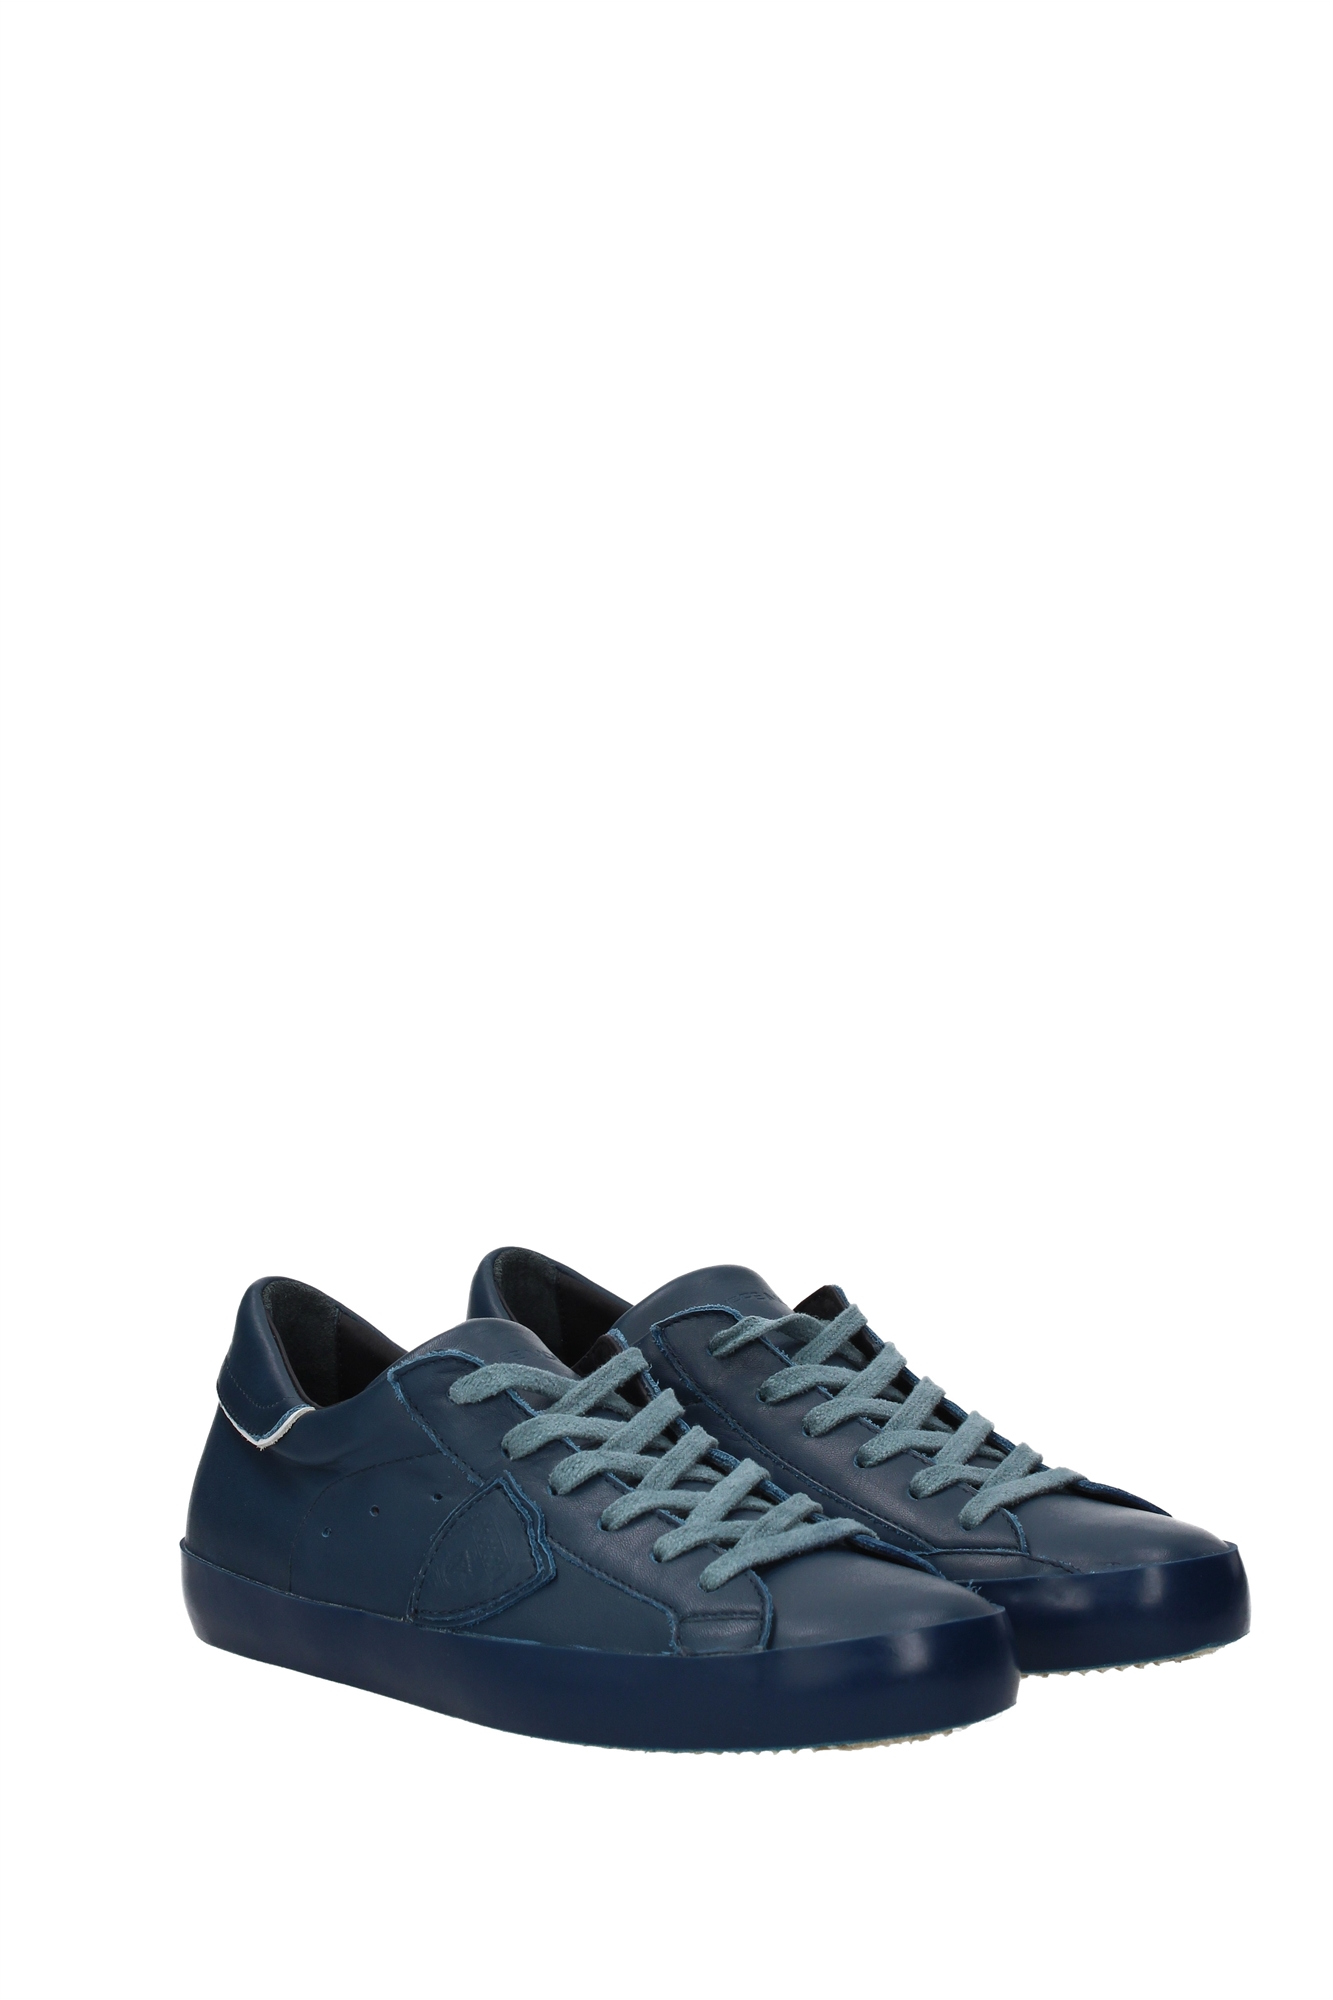 sneakers philipp plein herren leder blau cllurv14 ebay. Black Bedroom Furniture Sets. Home Design Ideas